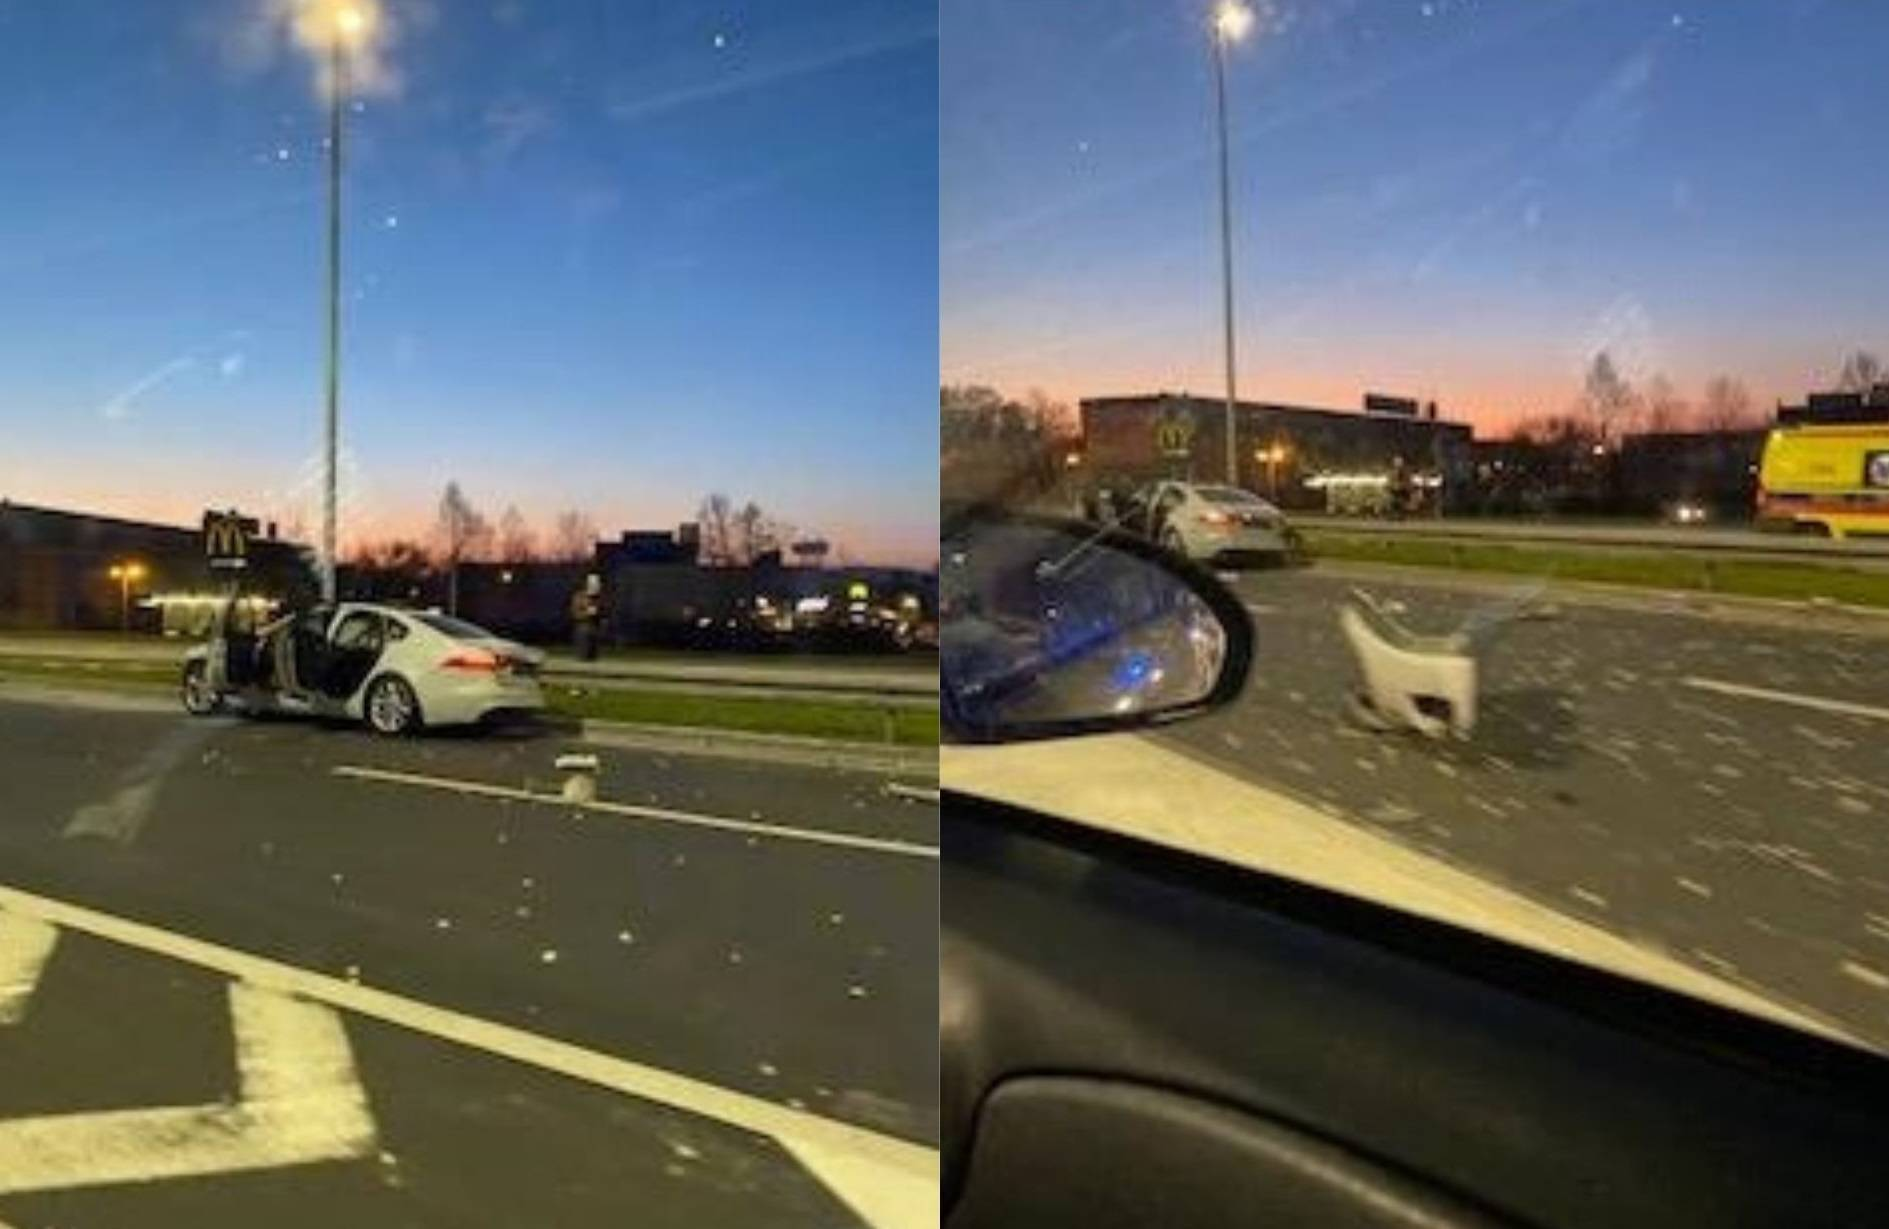 Nesreća kod Rotora: Dvoje ljudi hitno prevezeno u KBC Rebro